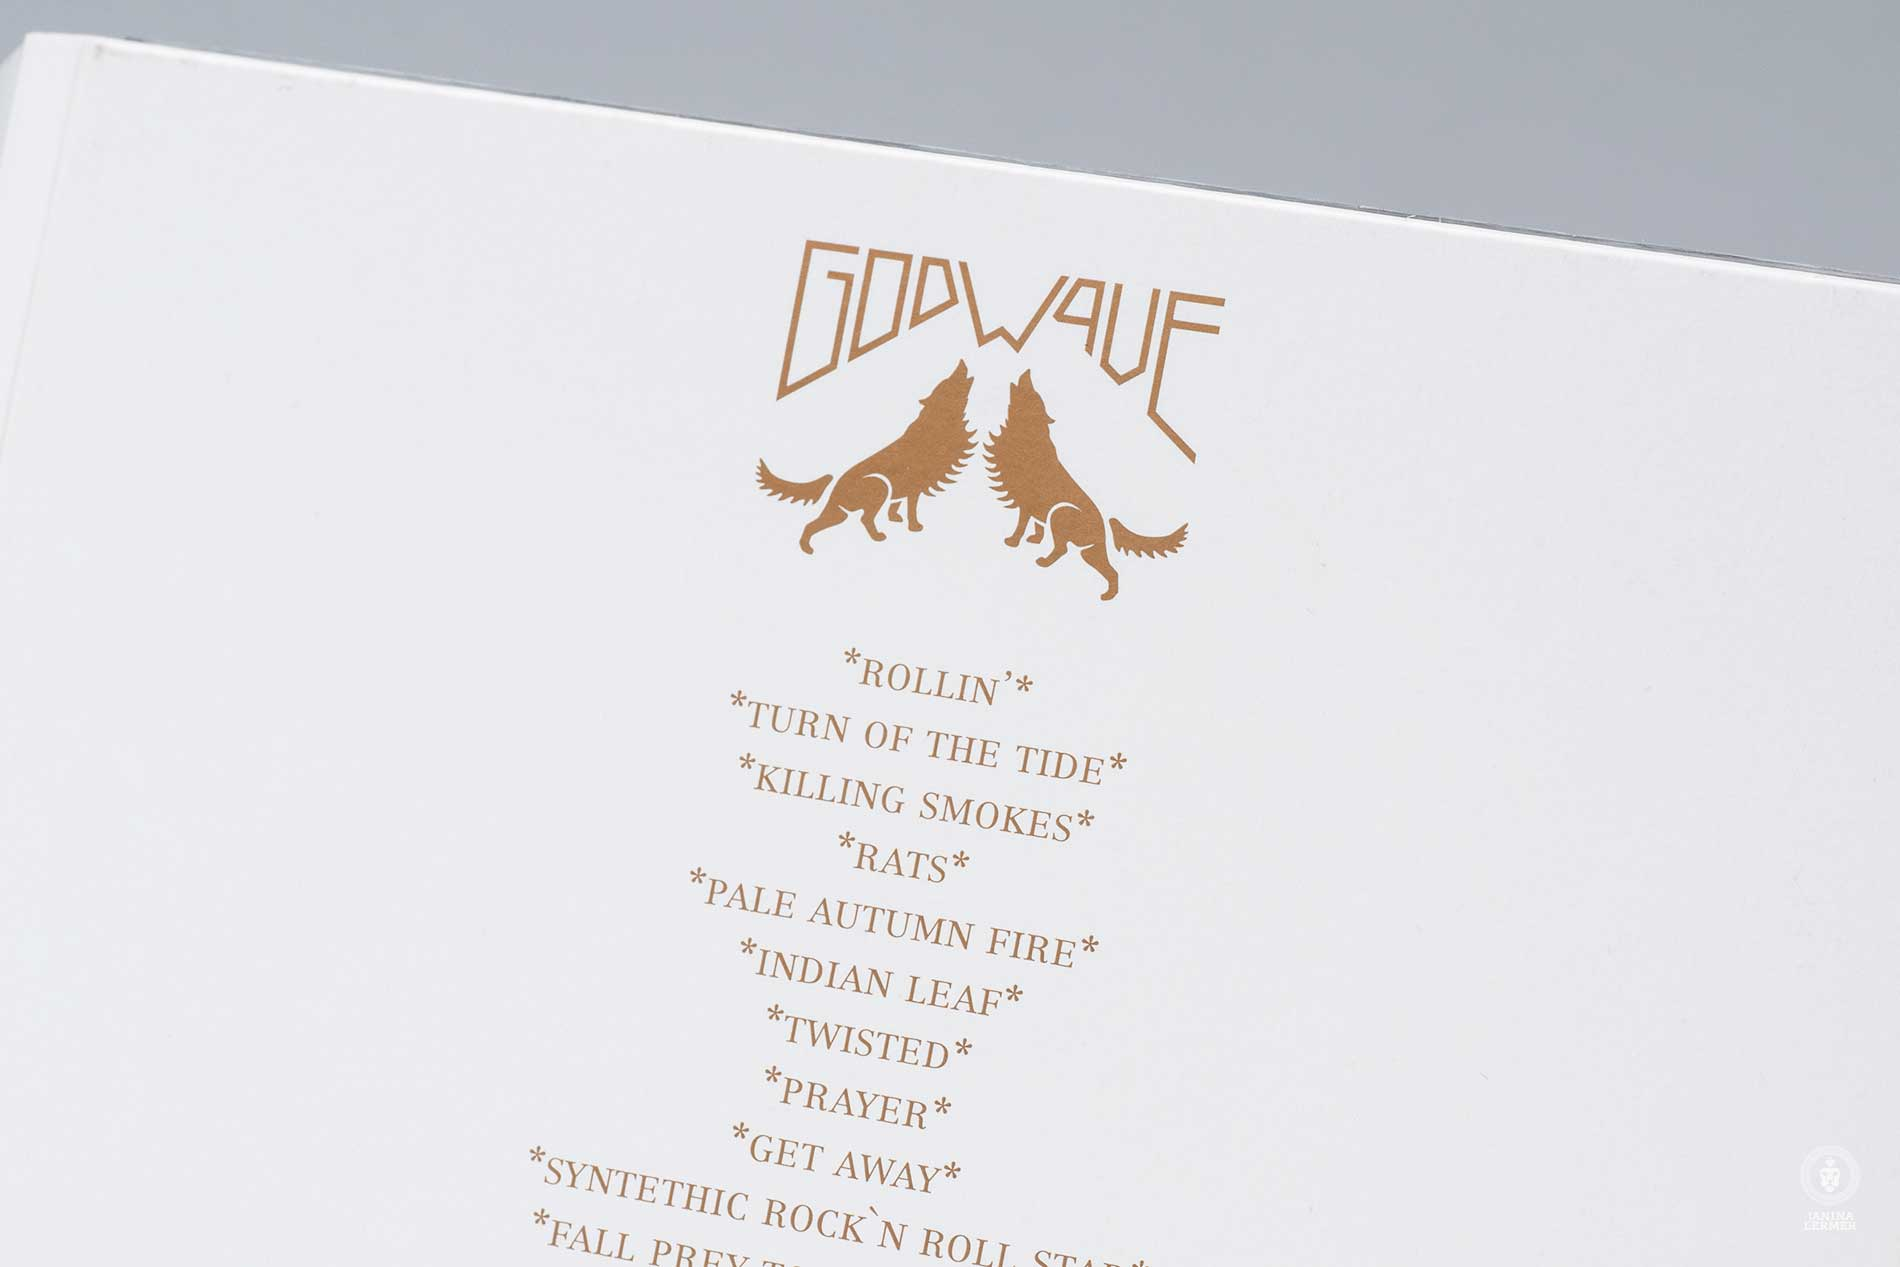 Janina-Lermer-Verpackungsgestaltung-Packagingdesign-CD-Cover-Rueckseite-Flipside-Band-Godwave